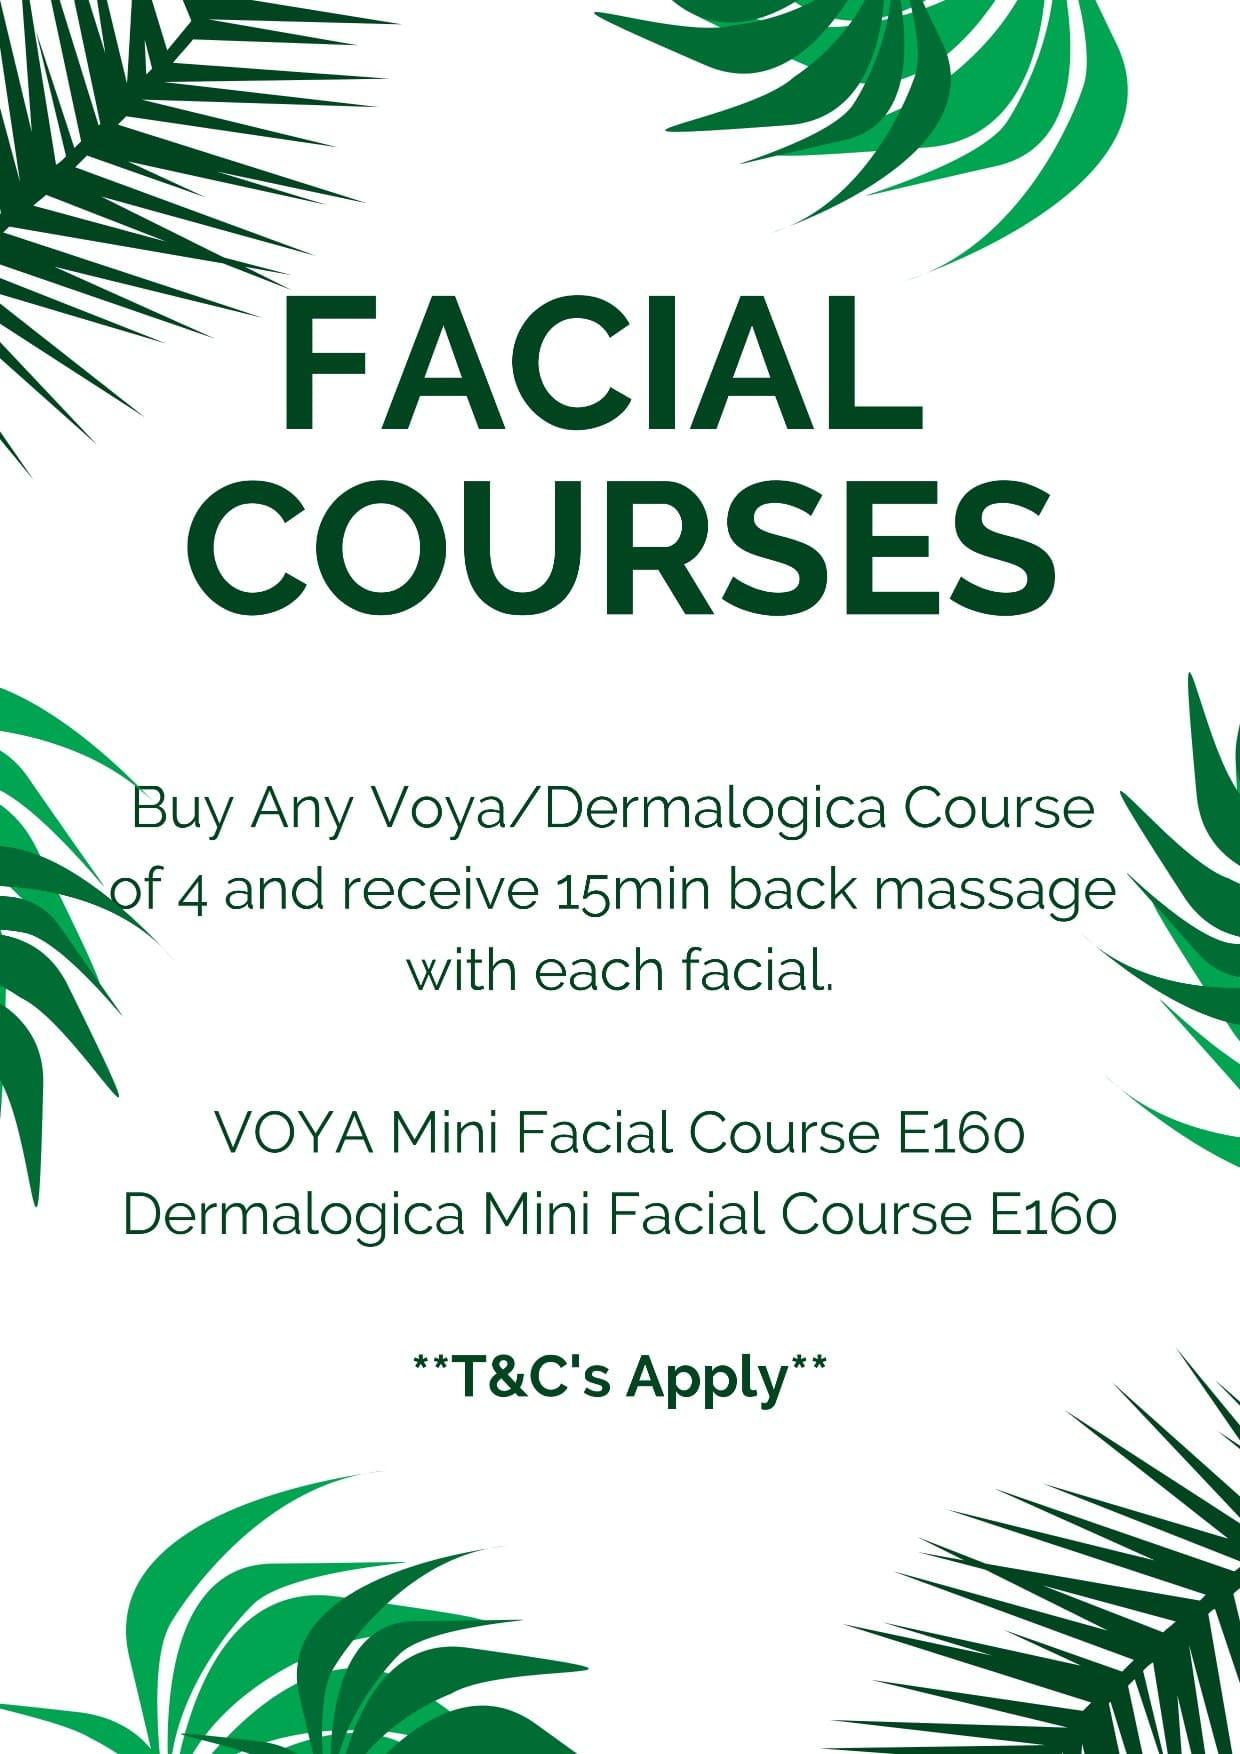 Offer - Facial Courses